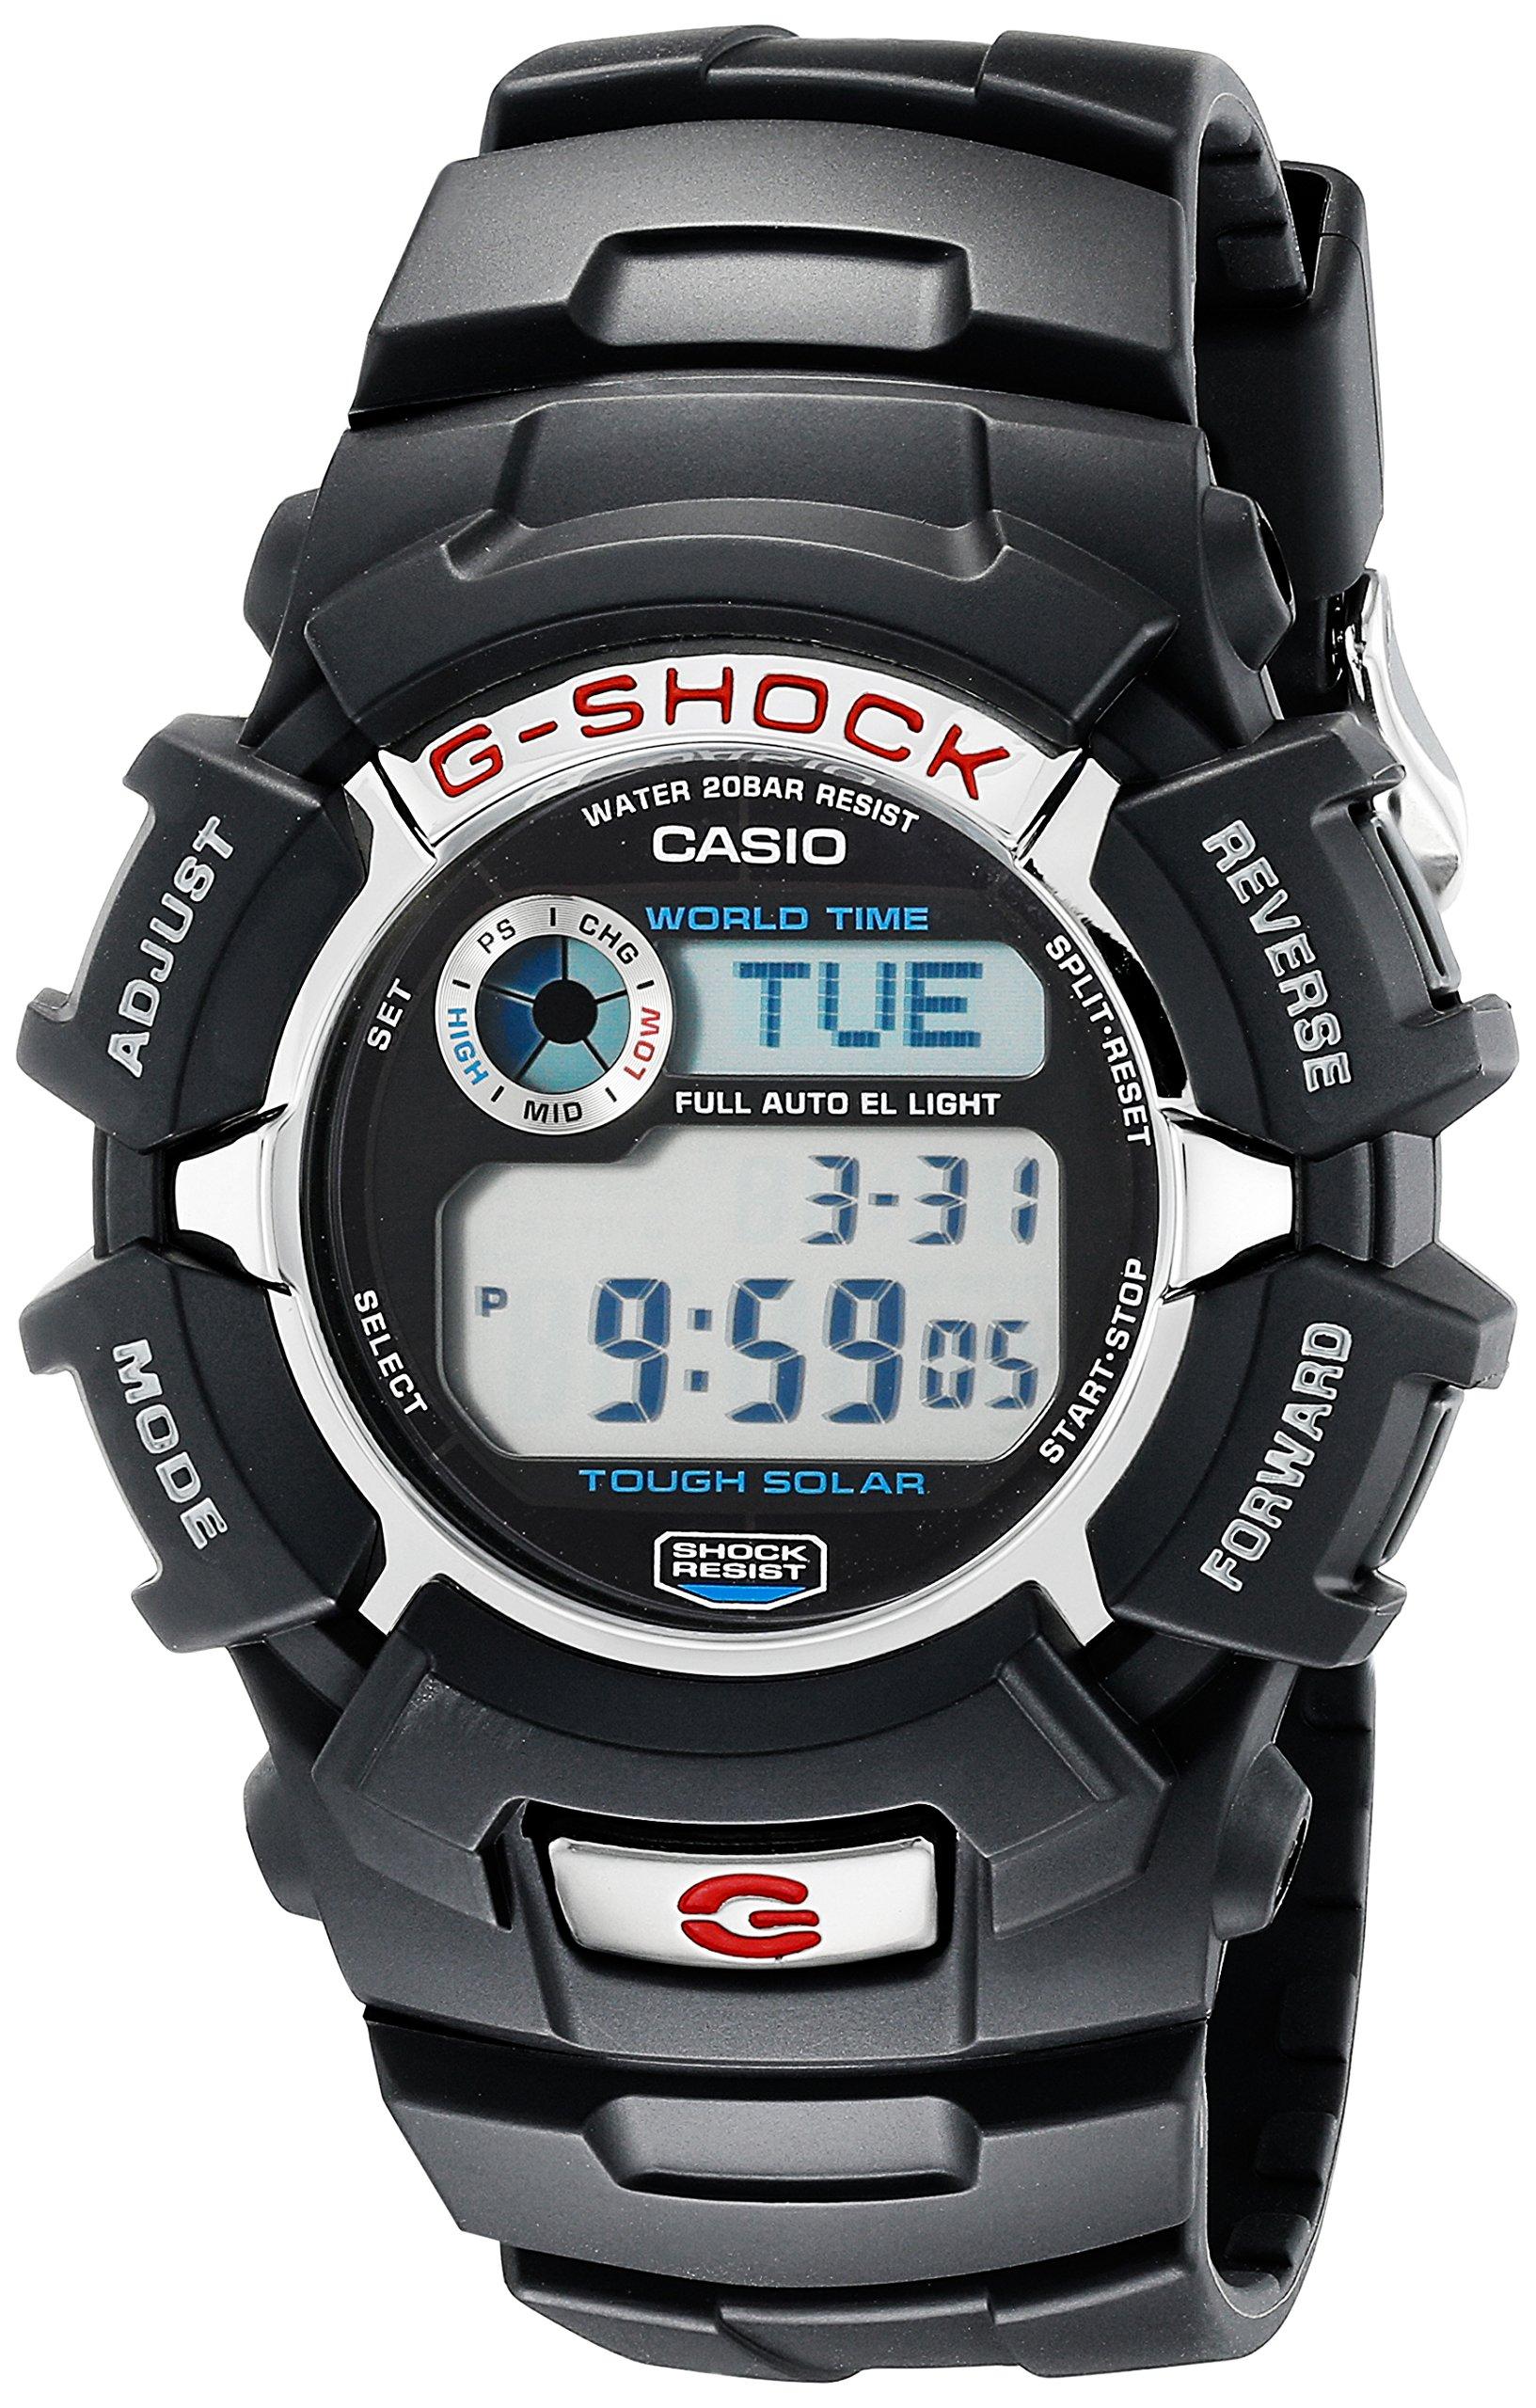 G-Shock G2310R-1 Men's Solar Black Resin Sport Watch by Casio